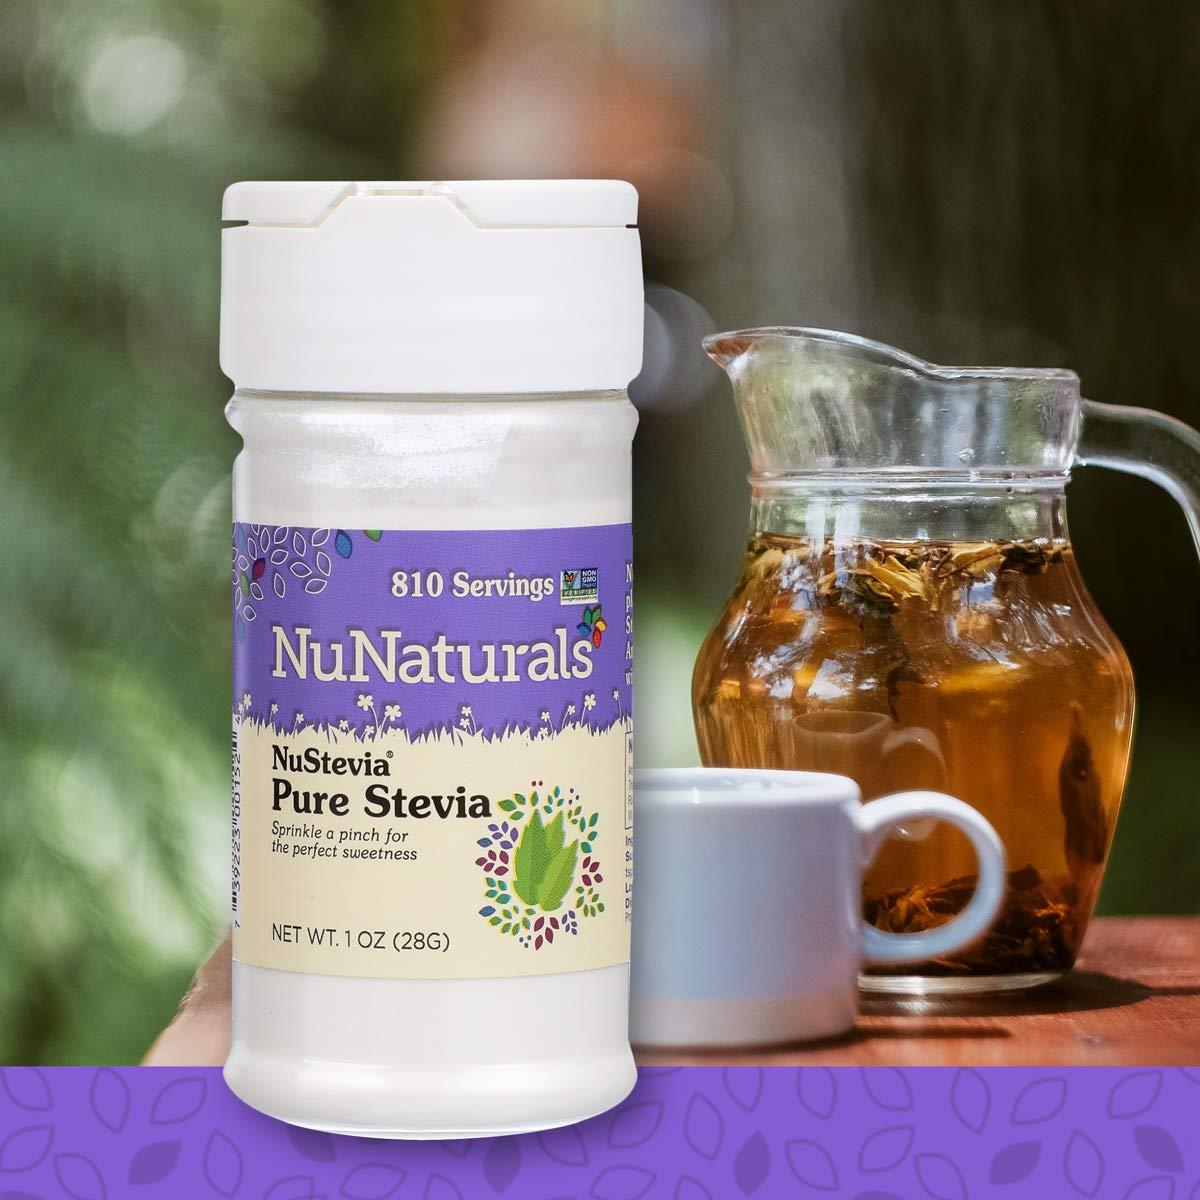 NuNaturals Pure White Stevia Extract Powder All Purpose Natural Sweetener, Sugar-Free, Zero Calorie (1 oz)